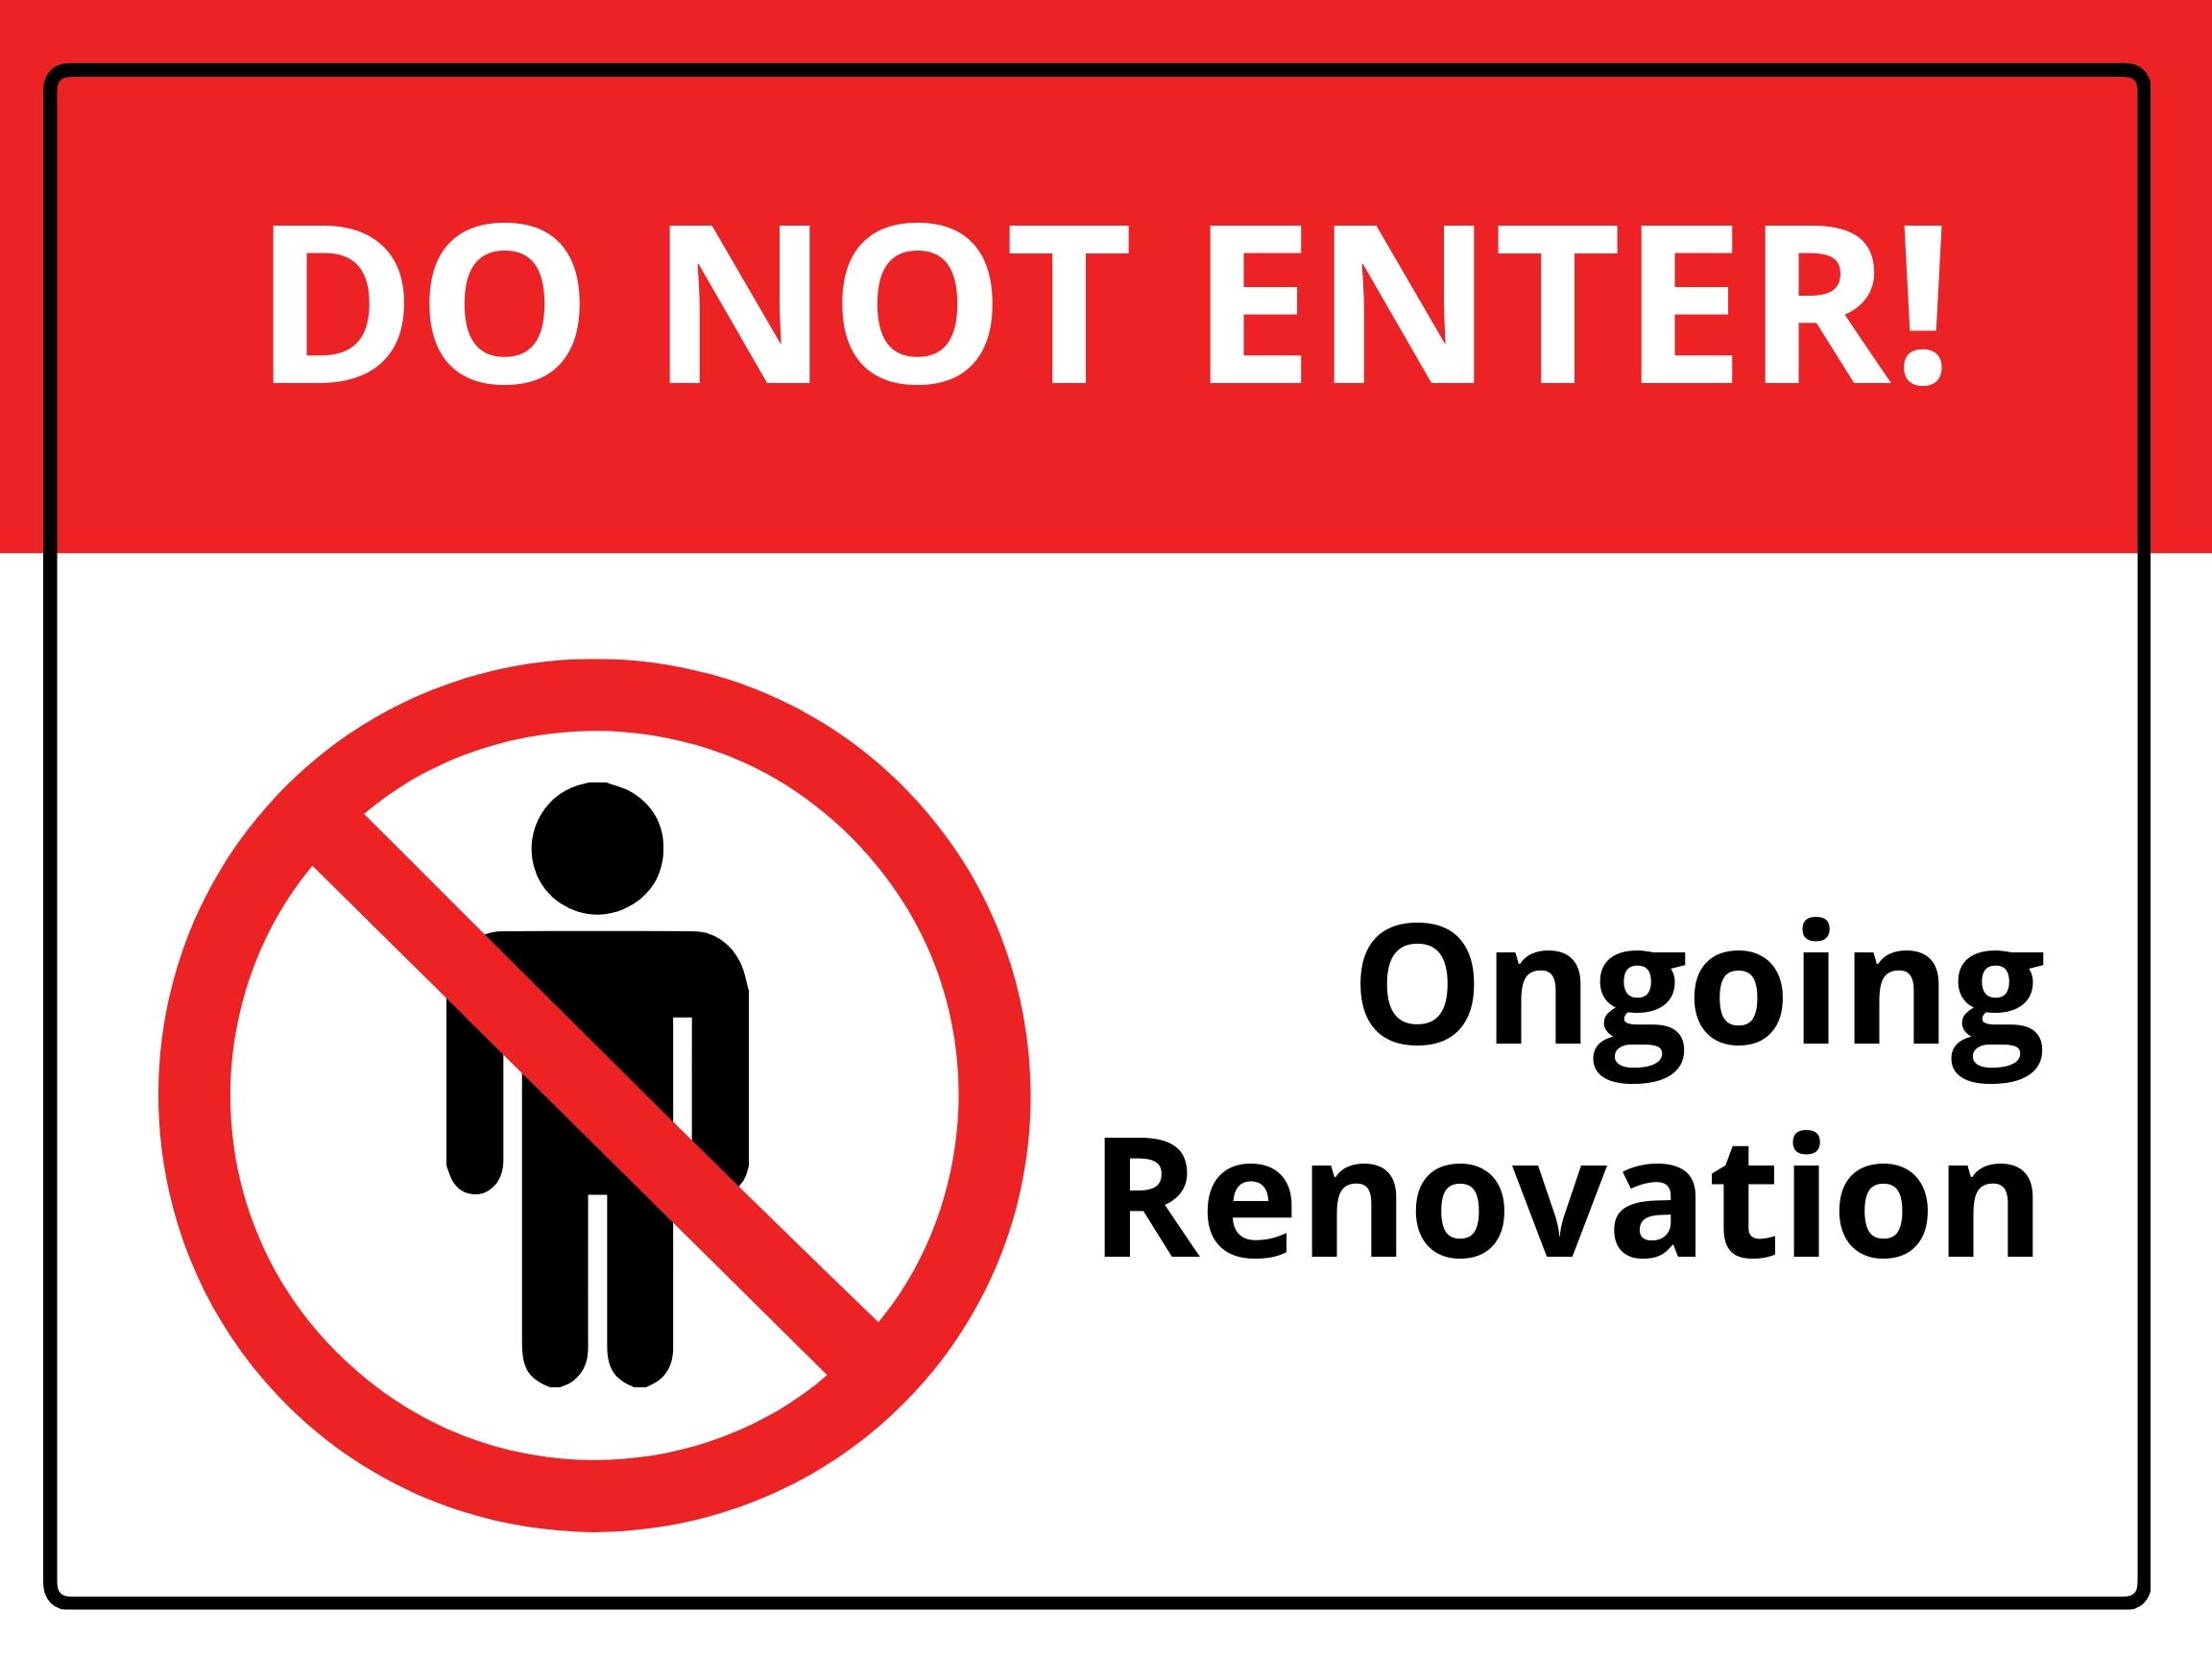 Caution - Renovation Work Do Not Enter Sign Template